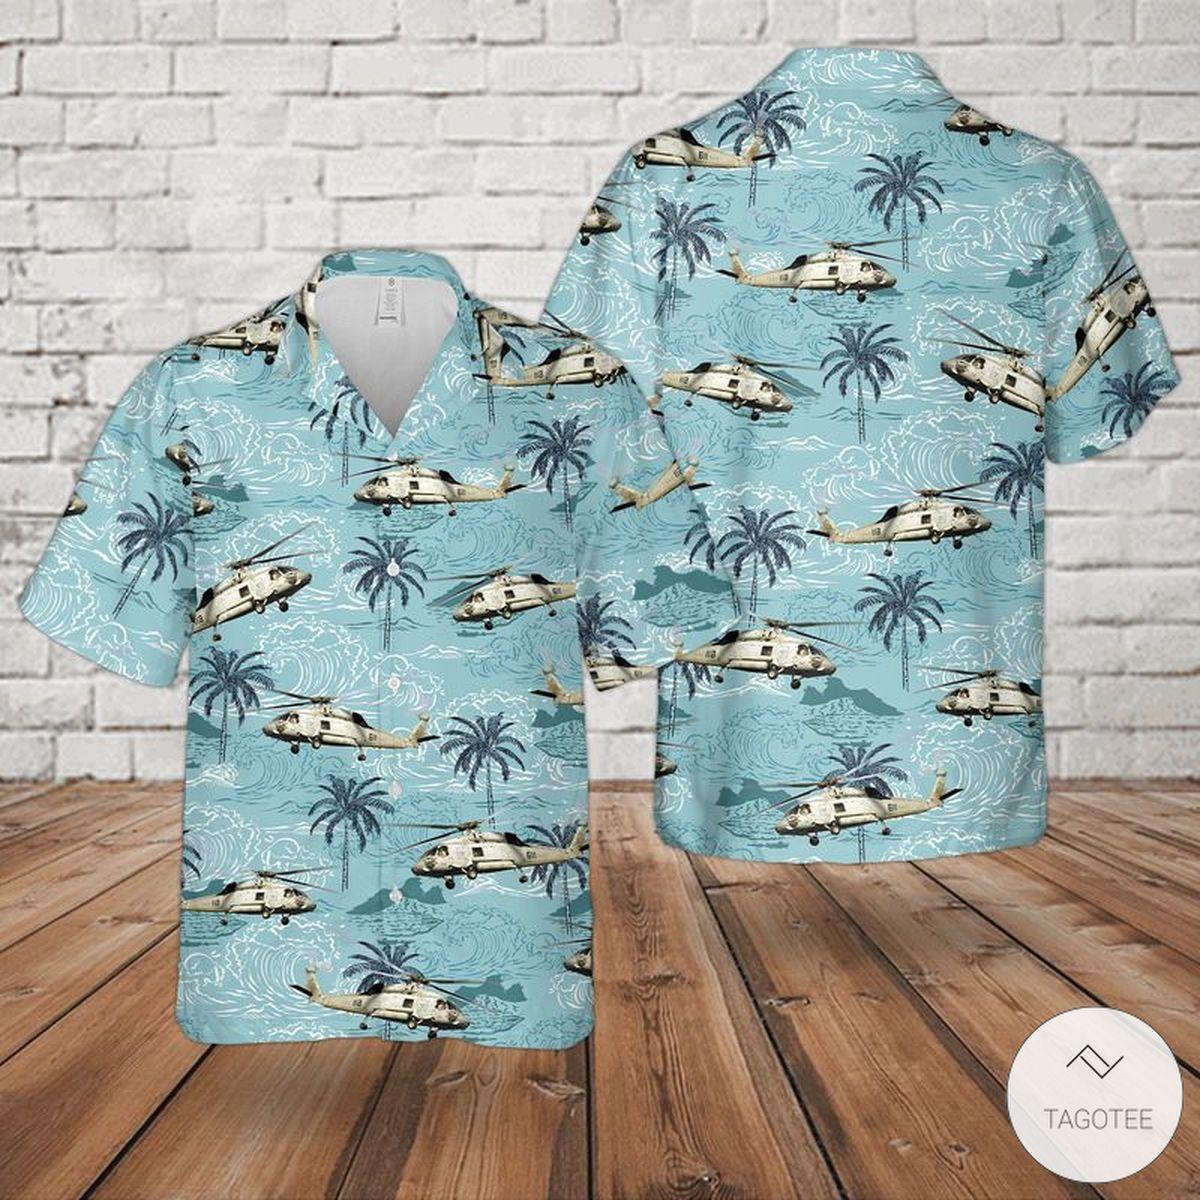 Us Navy Sikorsky SH-60 Seahawk Hawaiian Shirt, Beach Shorts